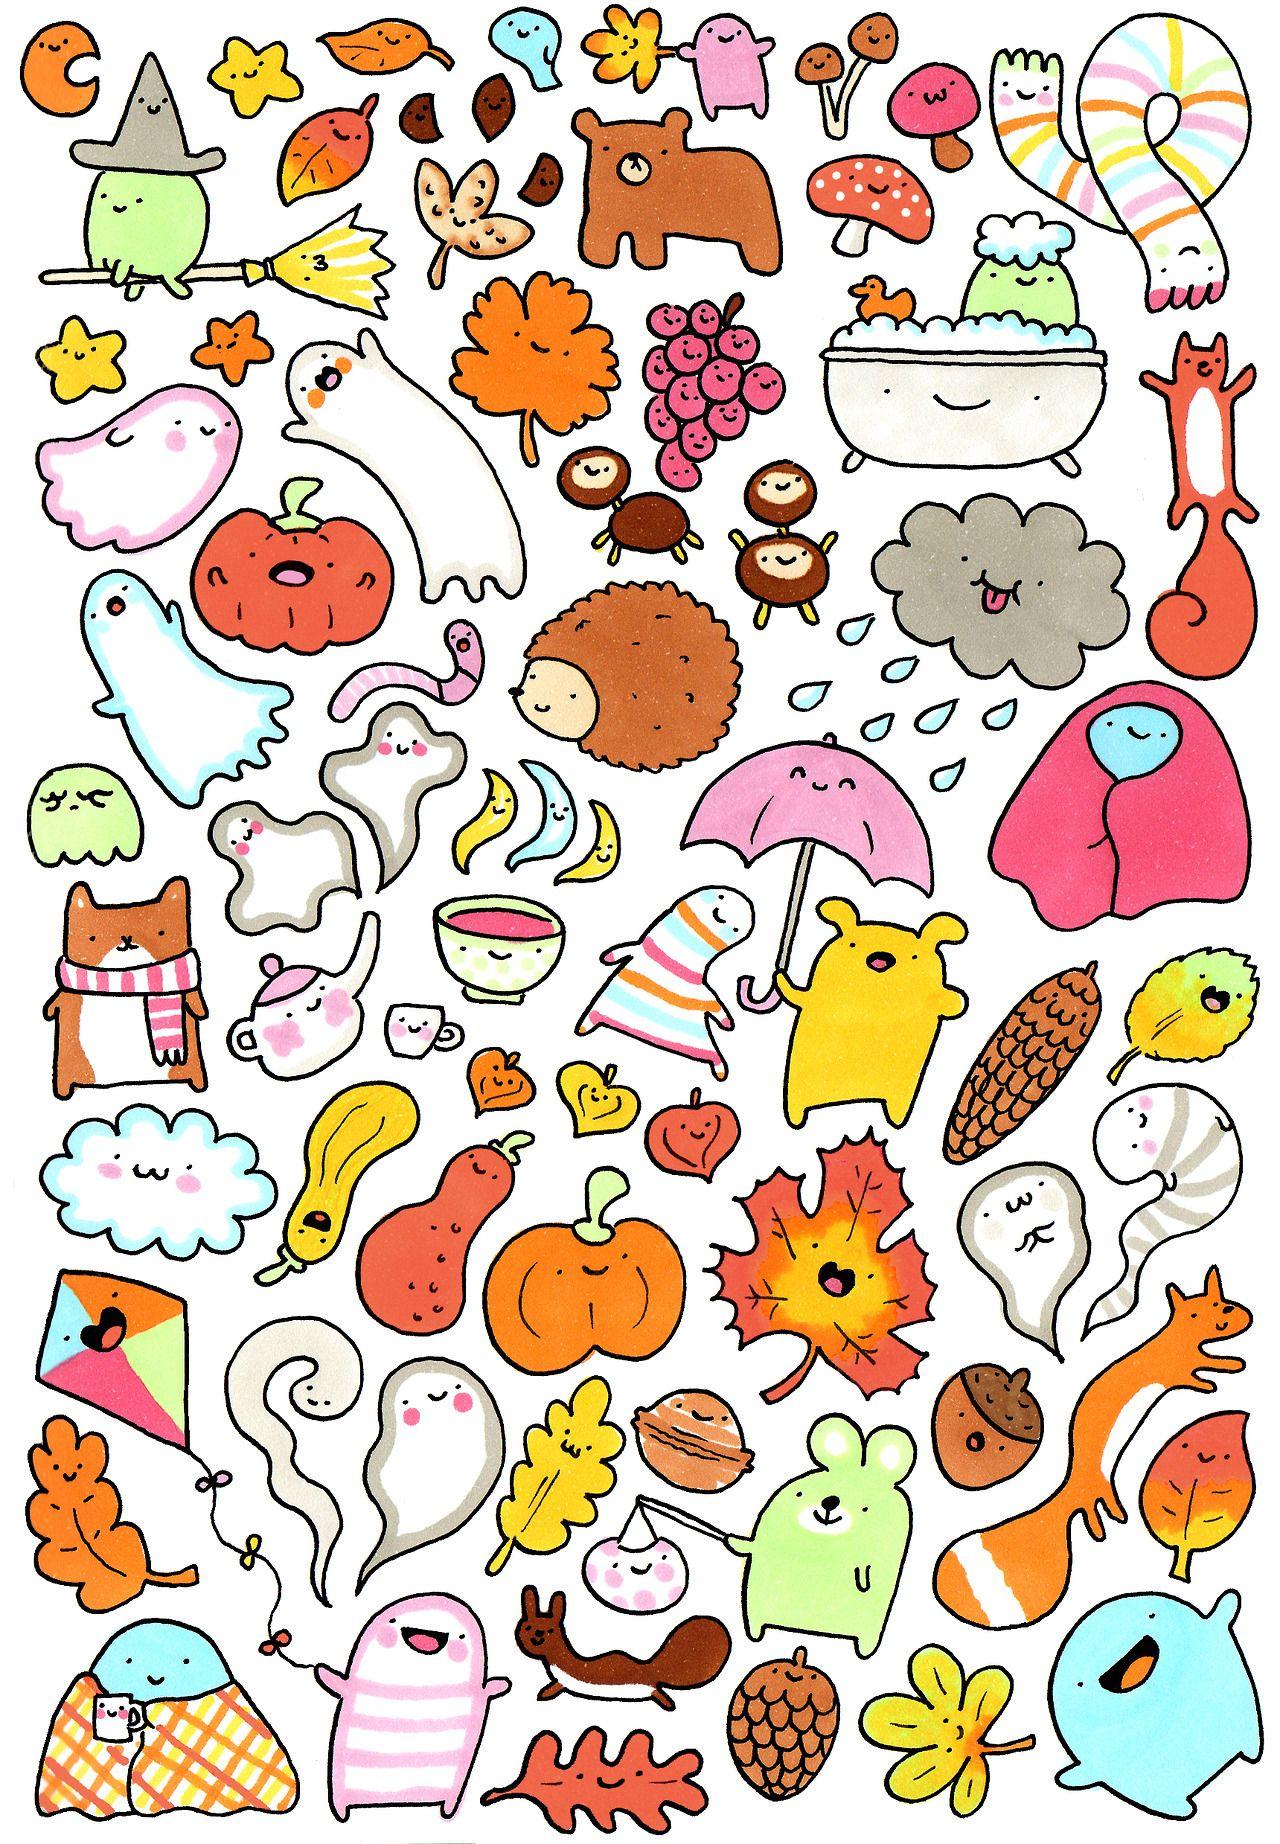 Pinterest Diy Home Decor Crafts Kawaii Doodles On Pinterest Doodle Monster Kawaii